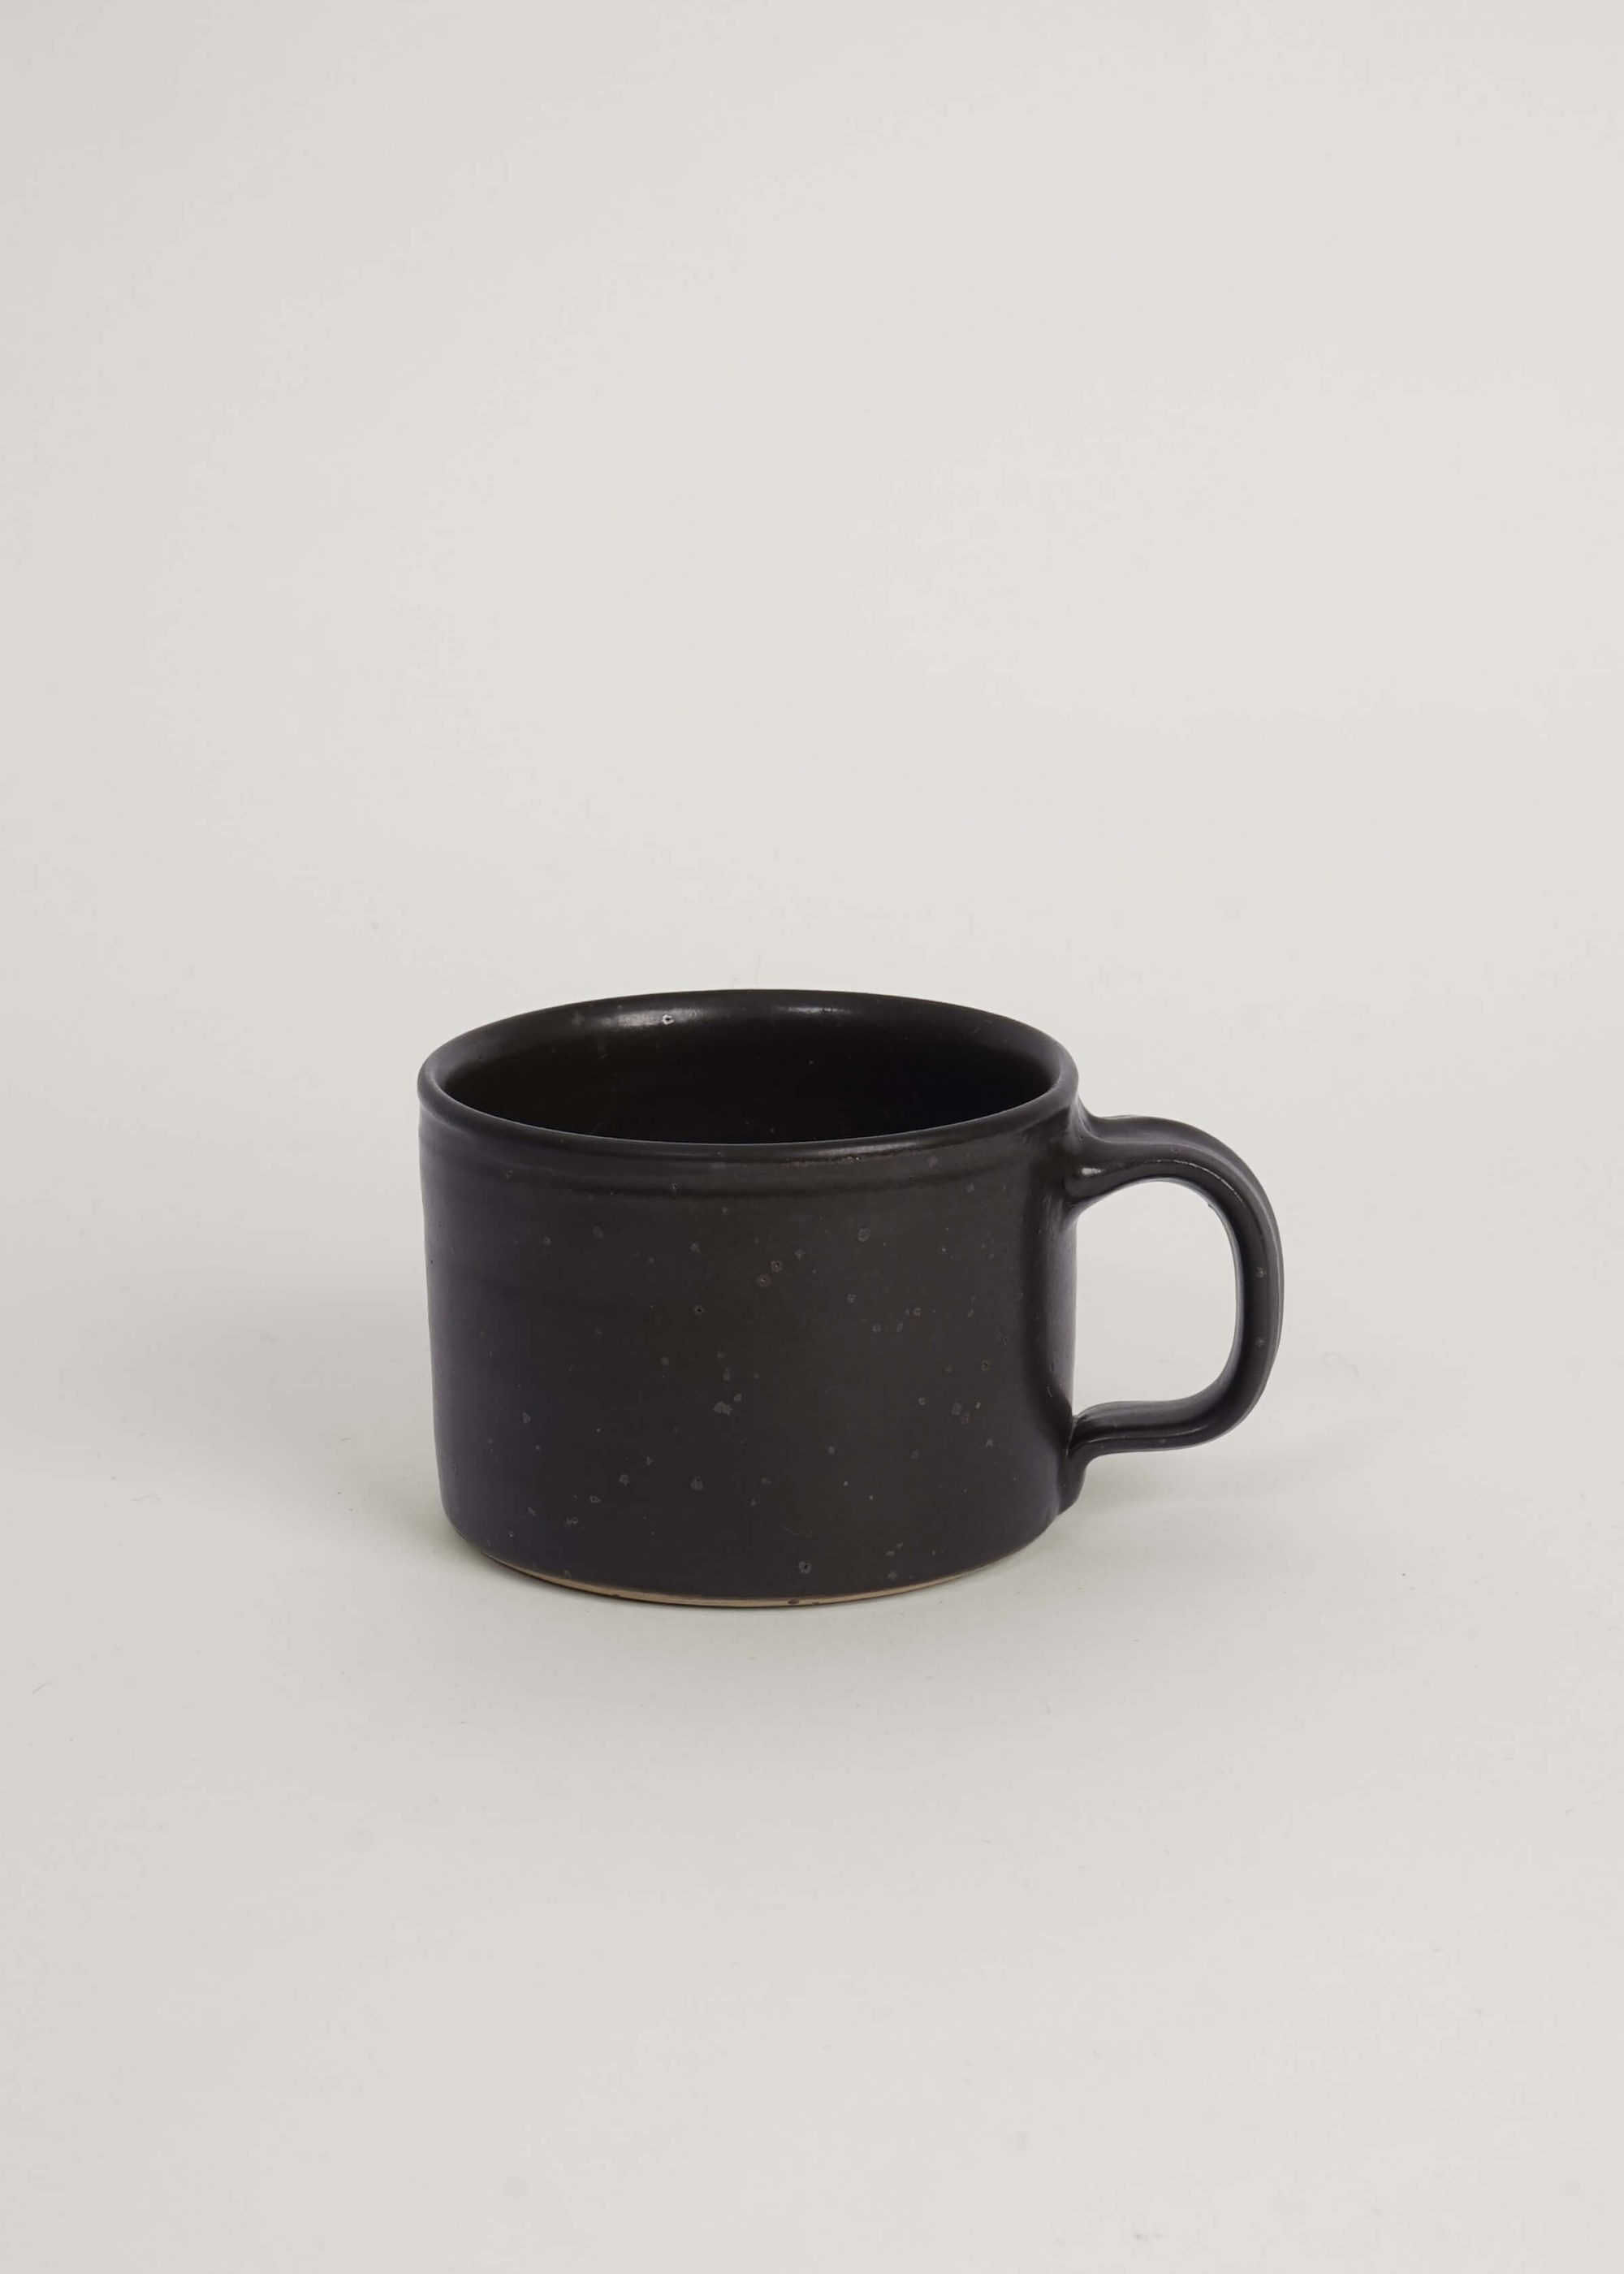 Product image for N° ICB2 Burri